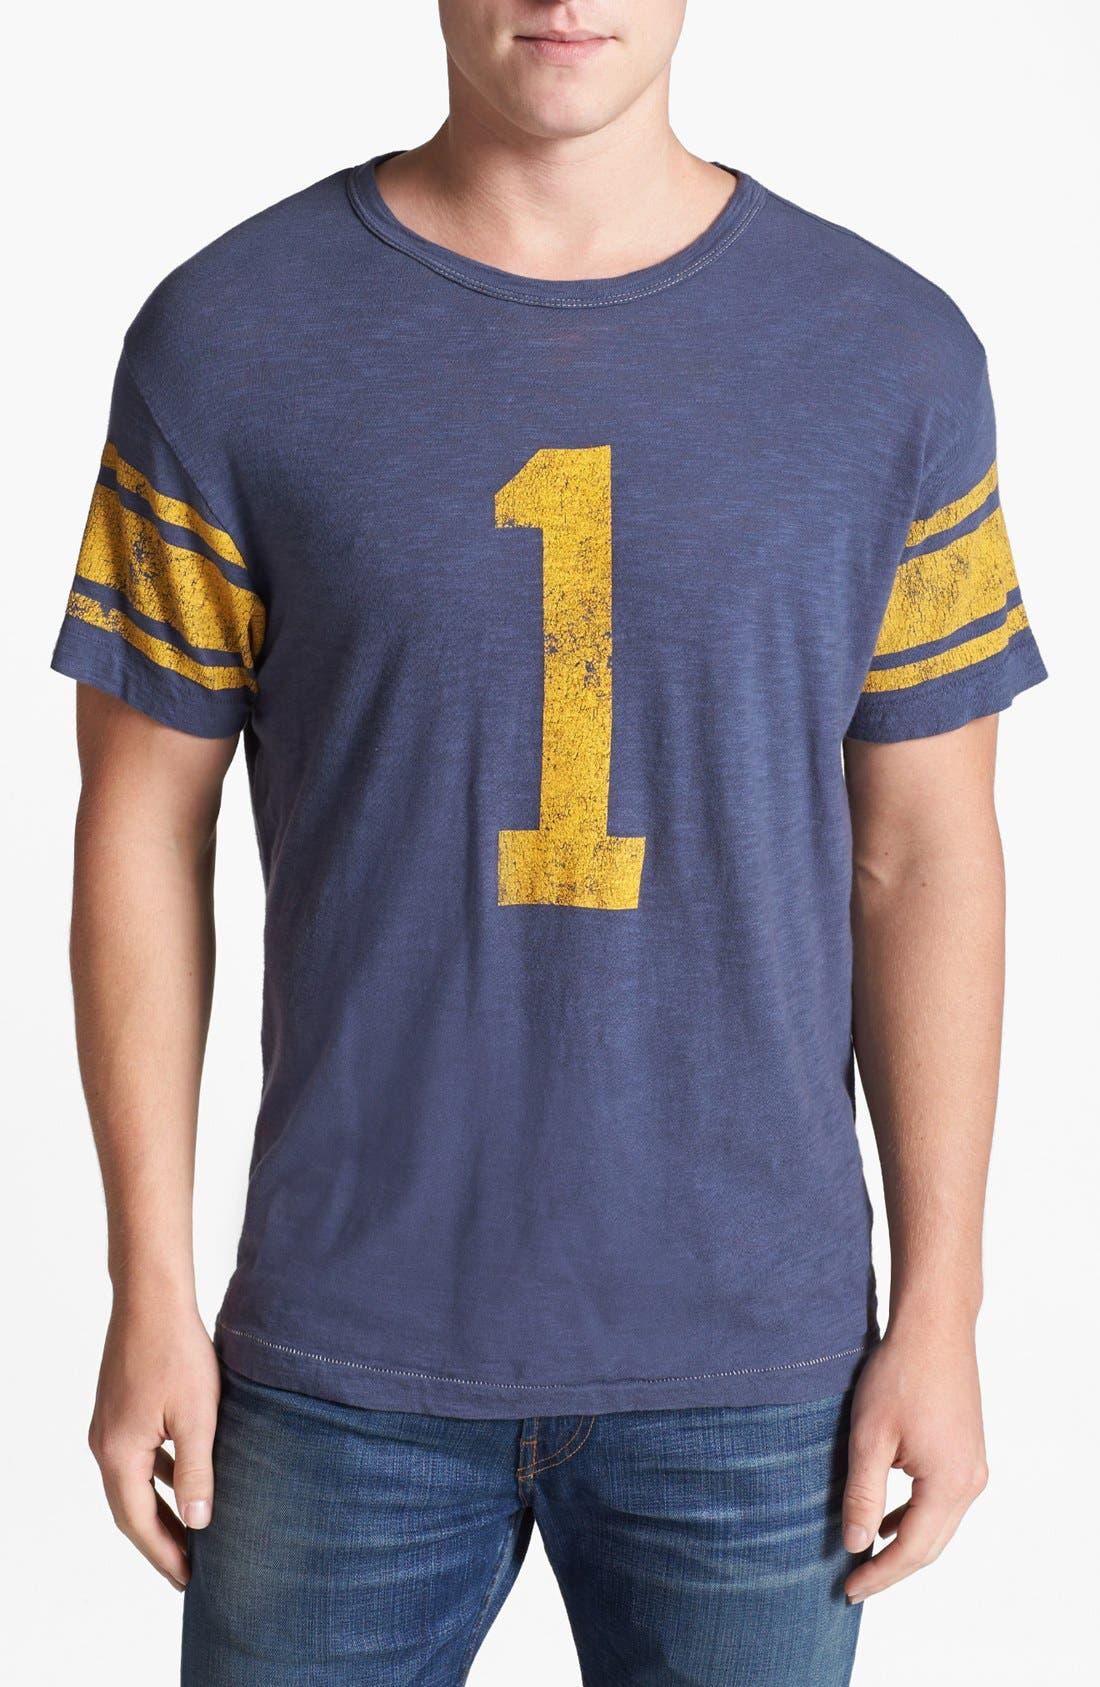 TODD SNYDER + CHAMPION, 'City Gym - Classic' Crewneck T-Shirt, Main thumbnail 1, color, 410